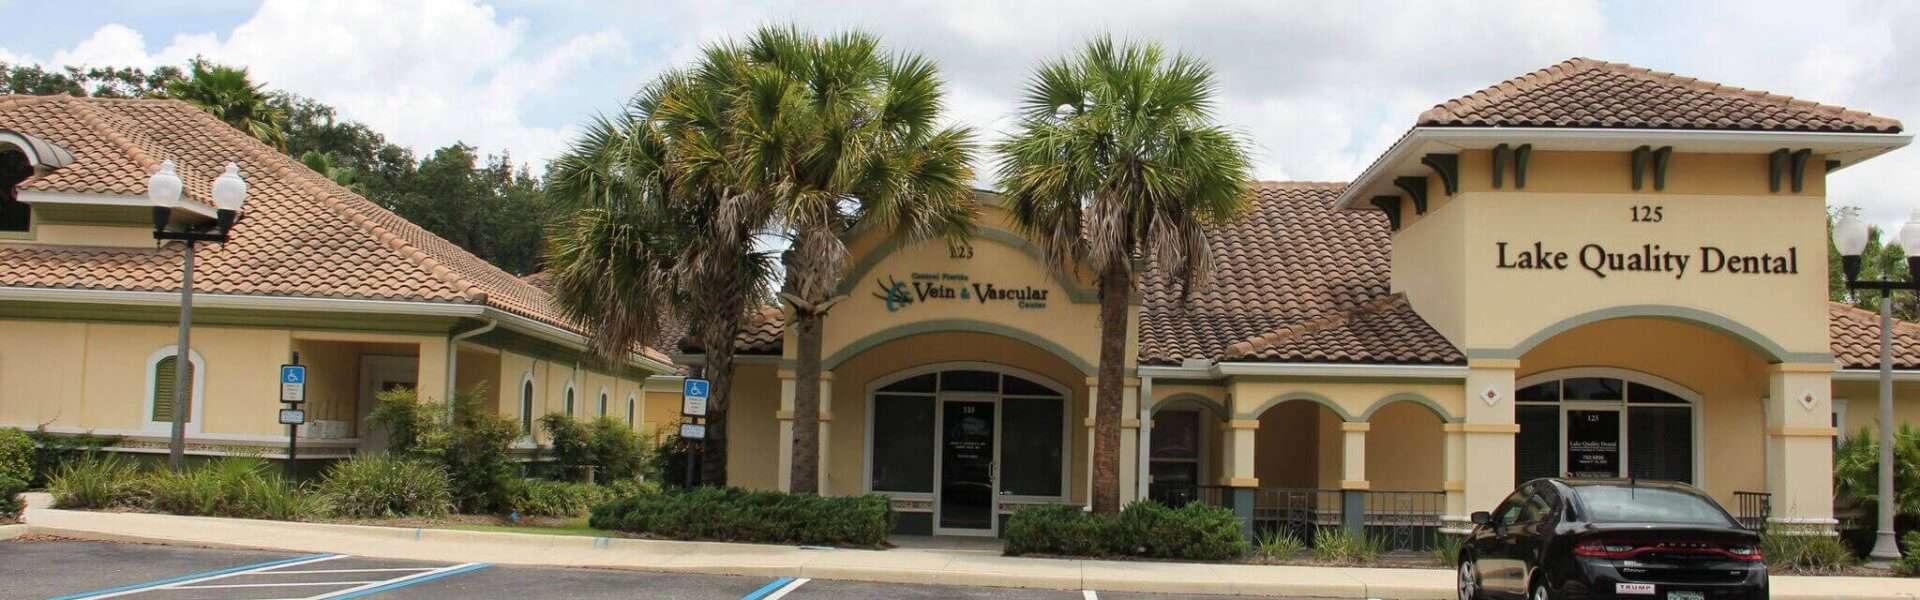 Vein Treatment Center in Ocoee, Florida